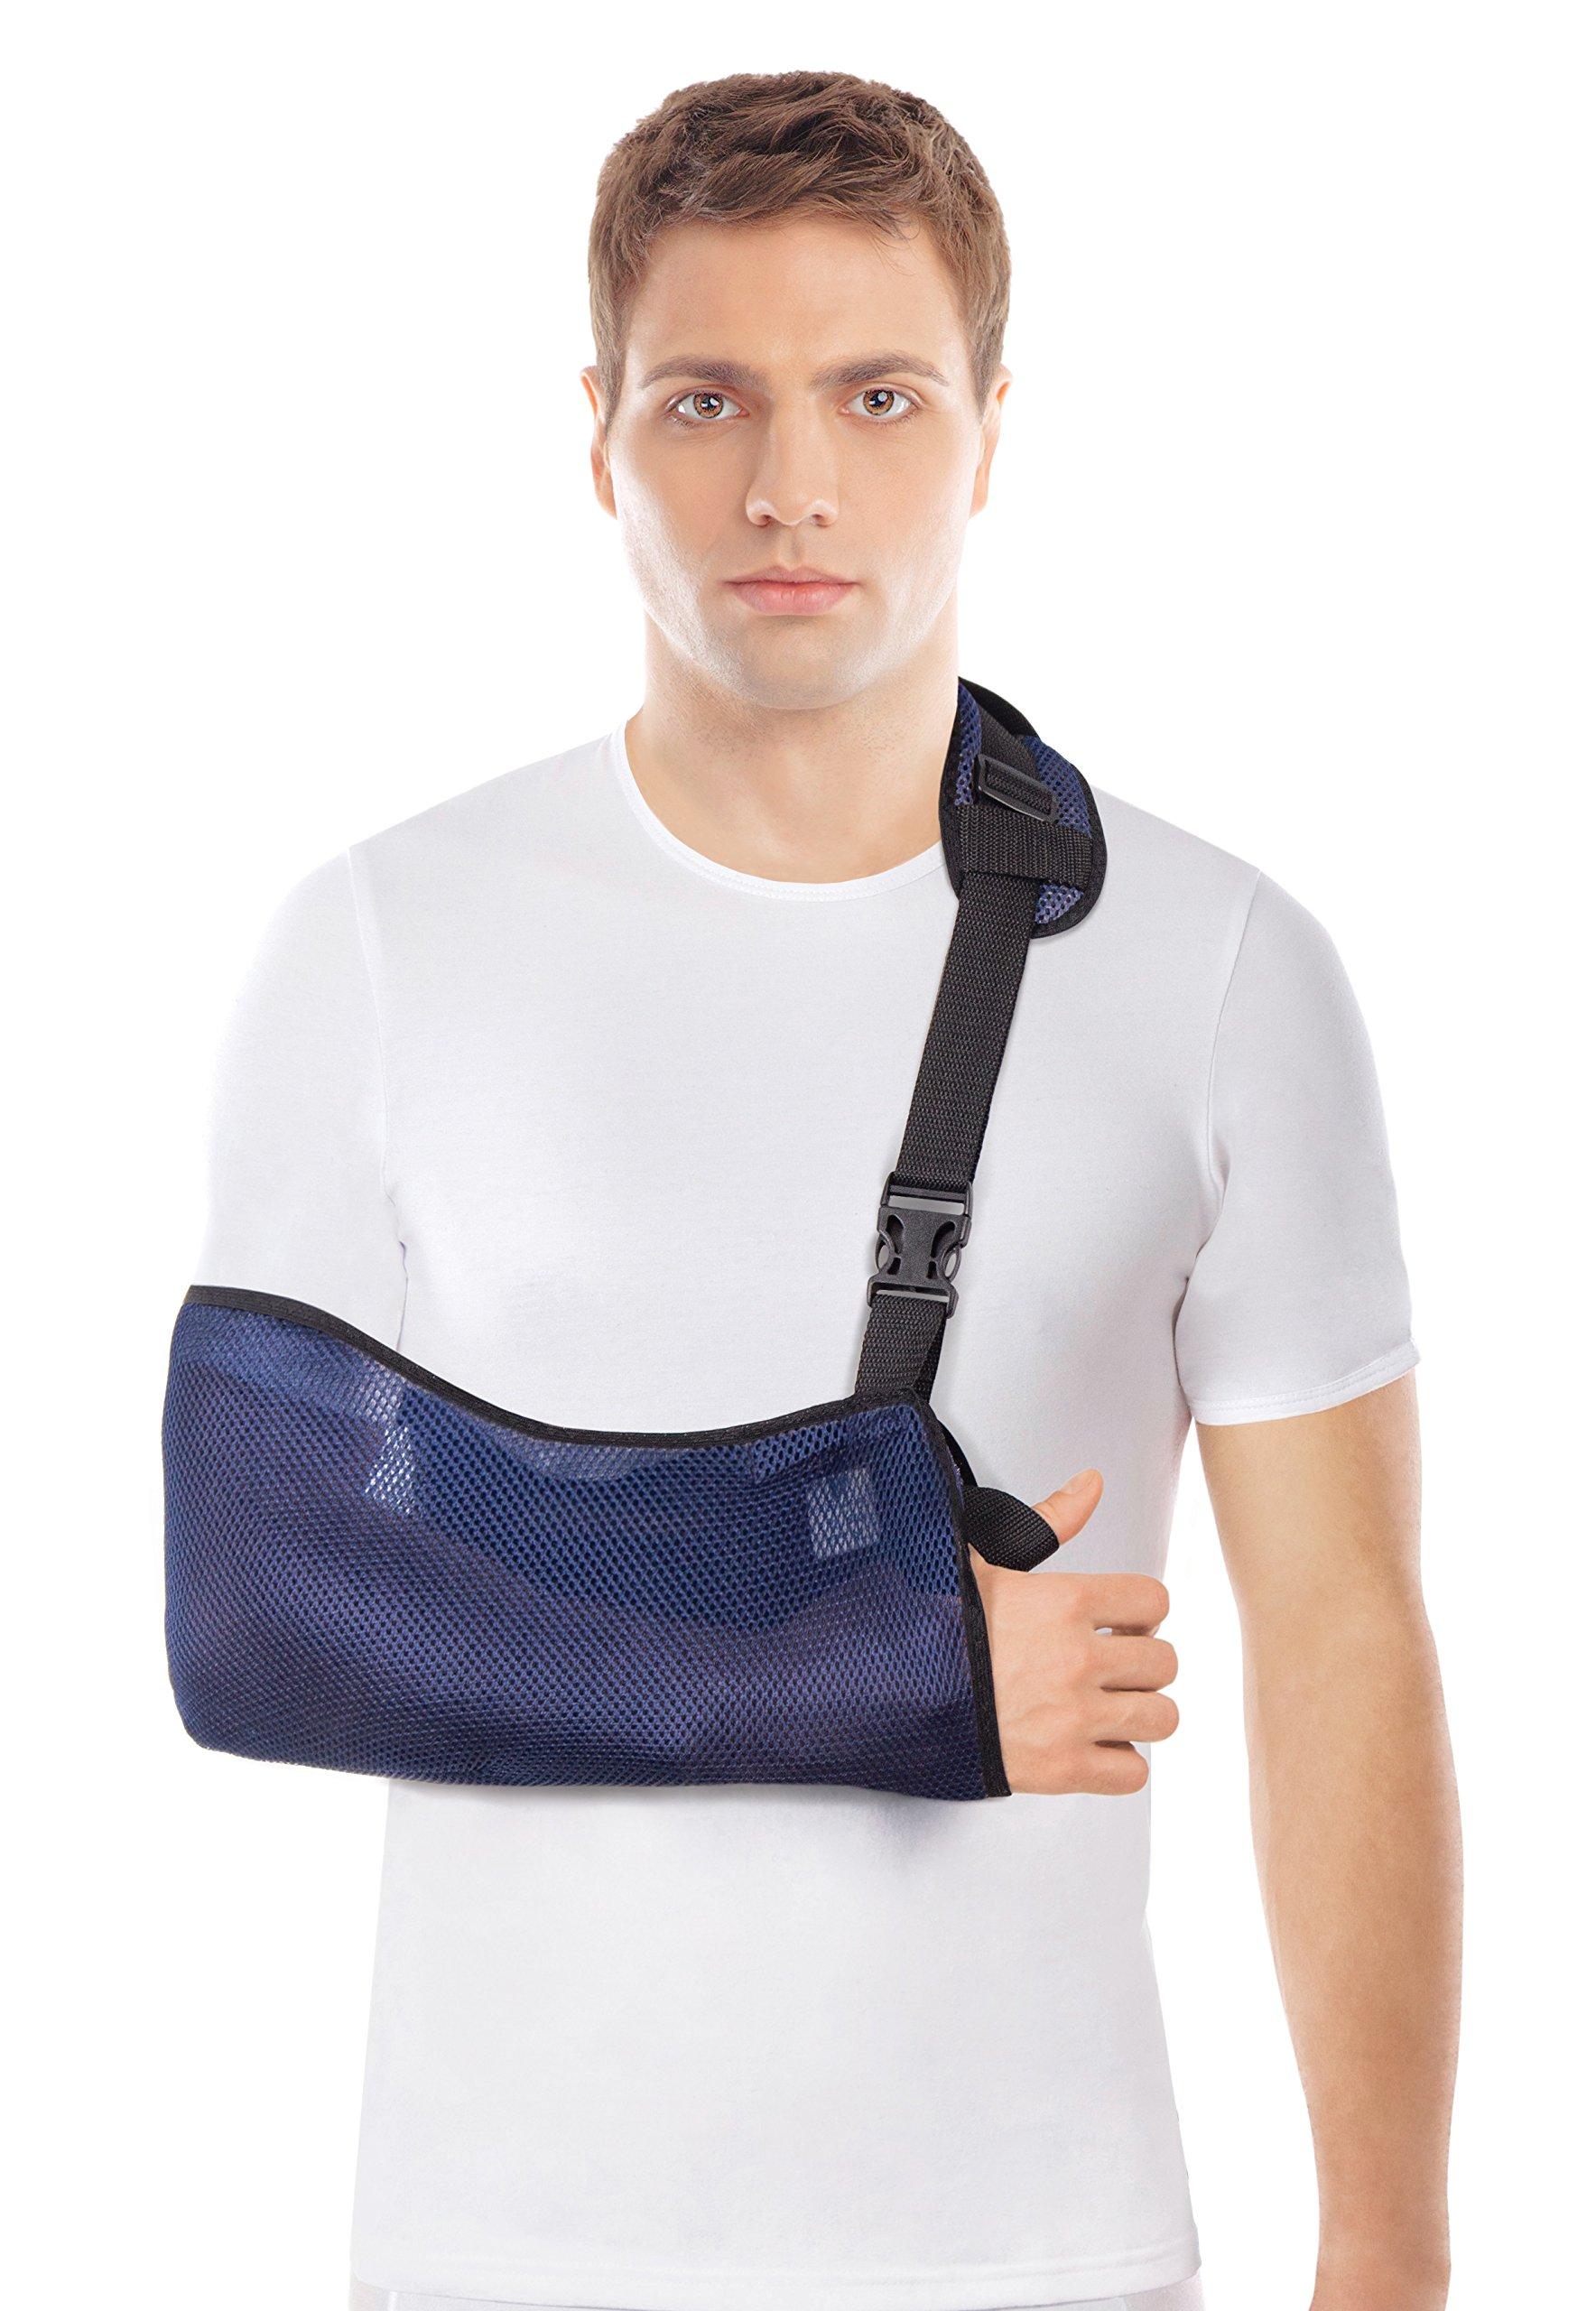 Arm Sling - Breathable Mesh – Lightweight (Medium, Blue)